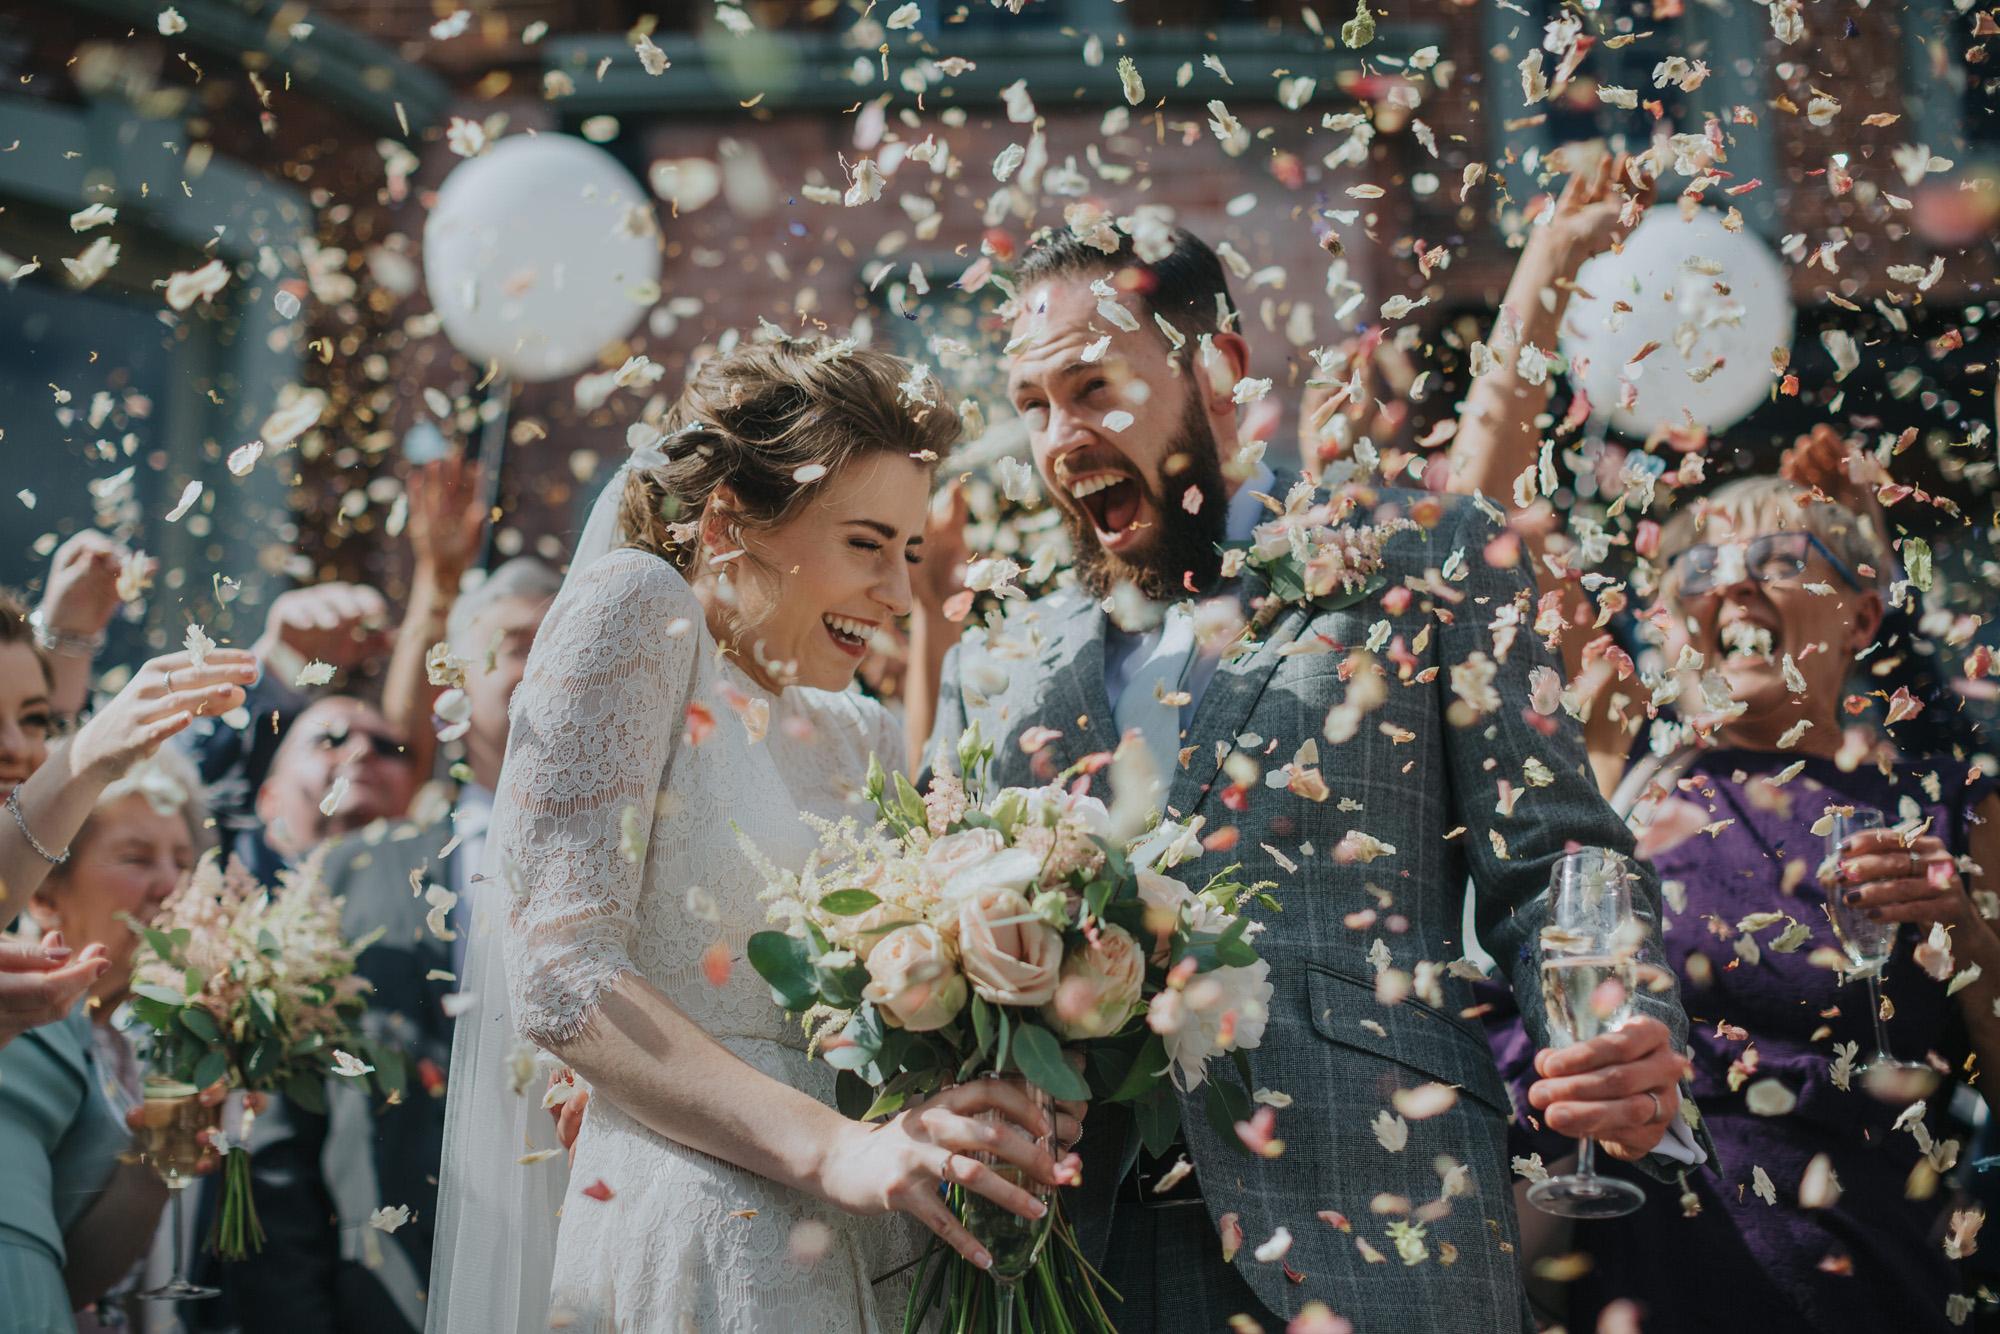 Kate-Beaumont-Lace-Flared-Dahlia-Gown-Leeds-Wedding-Bloom-Weddings-29.jpg